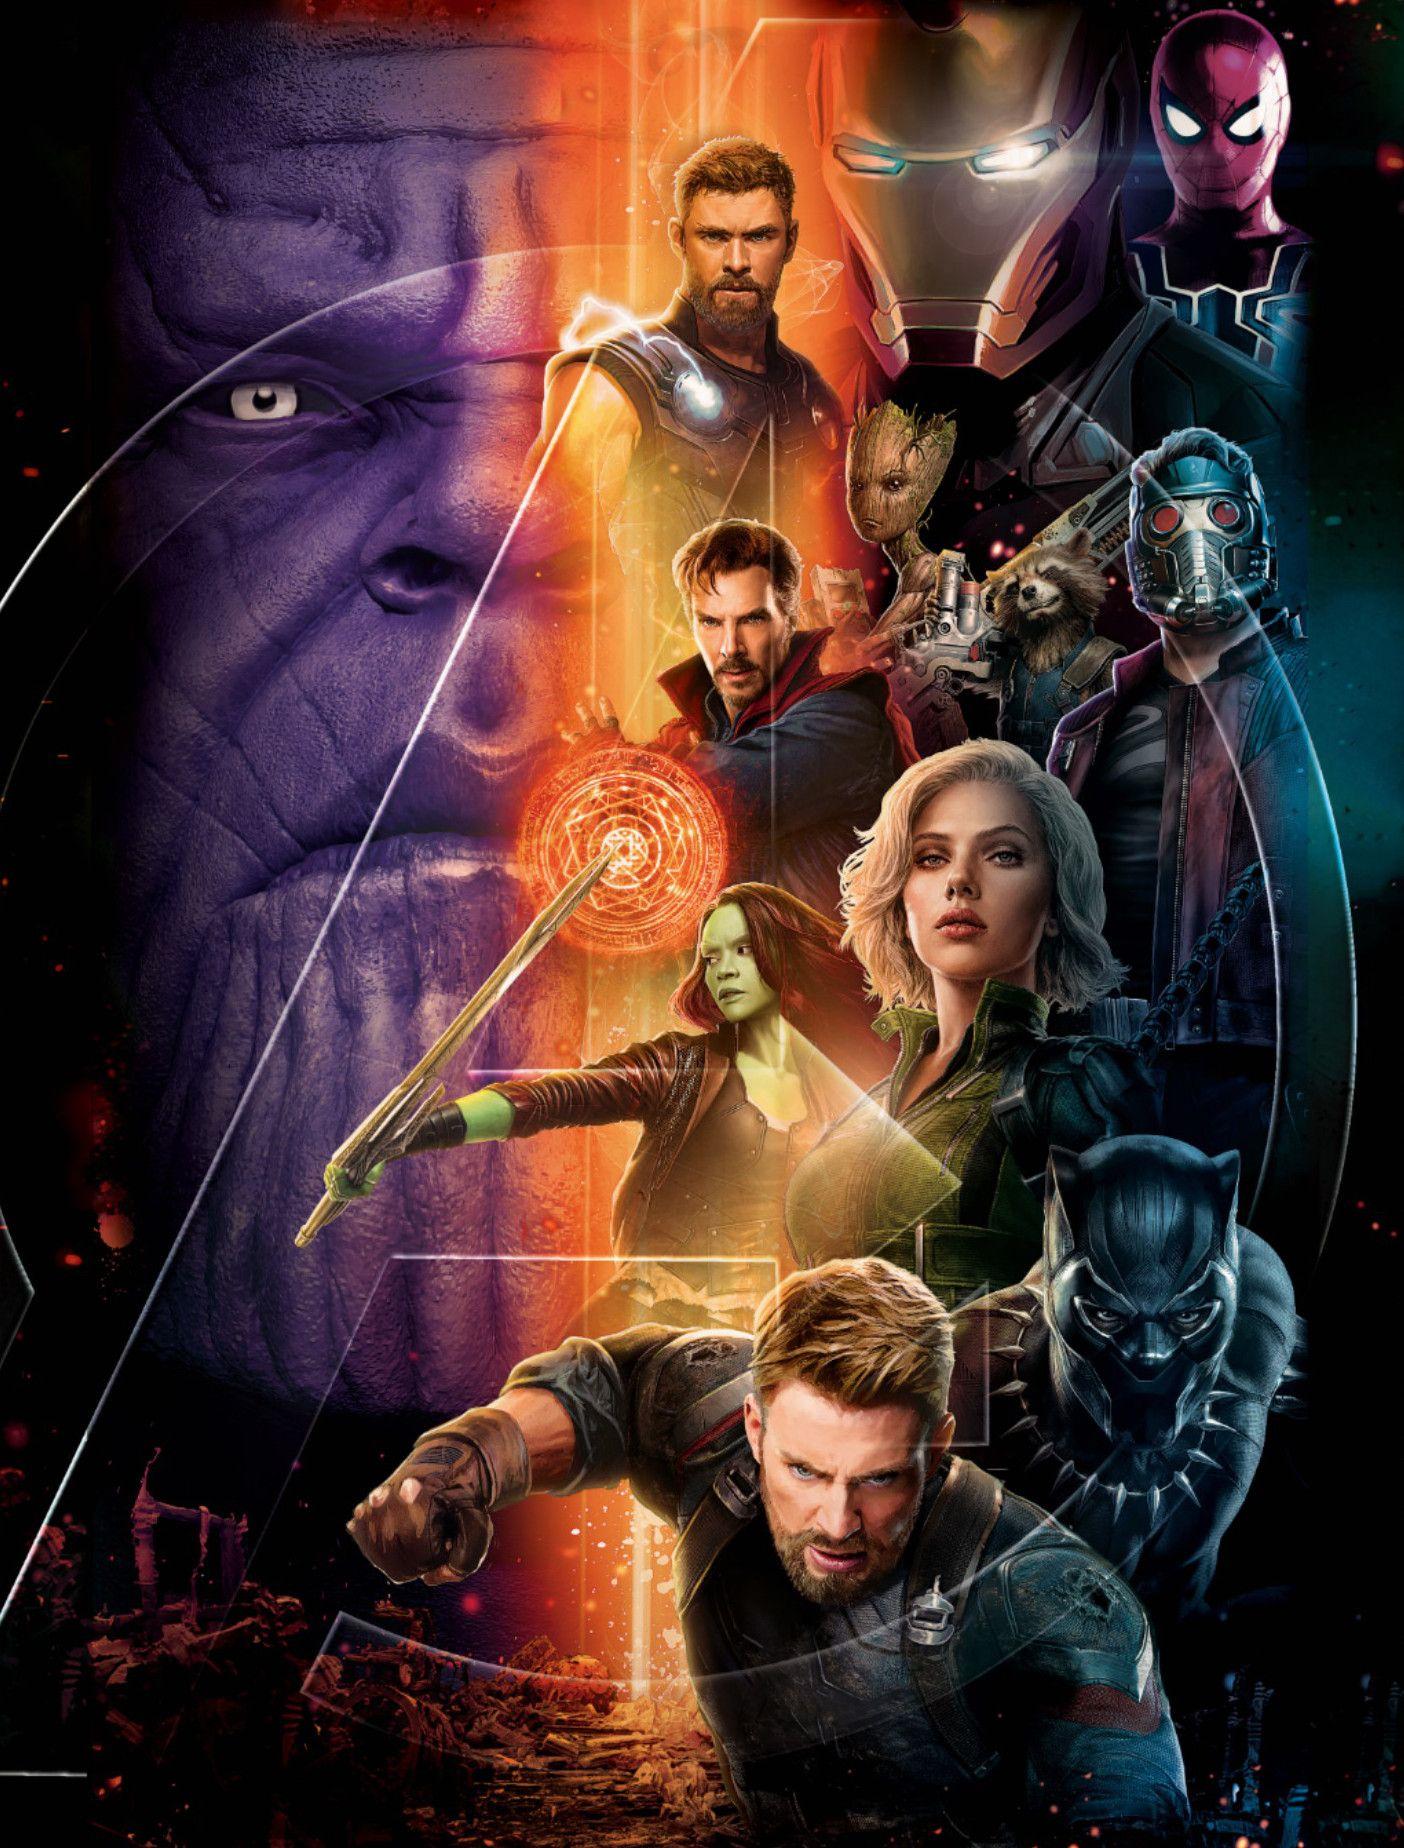 Avengers Infinity War Assembles In New Poster Art Marvel Cinematic Marvel Cinematic Universe Avengers Infinity War